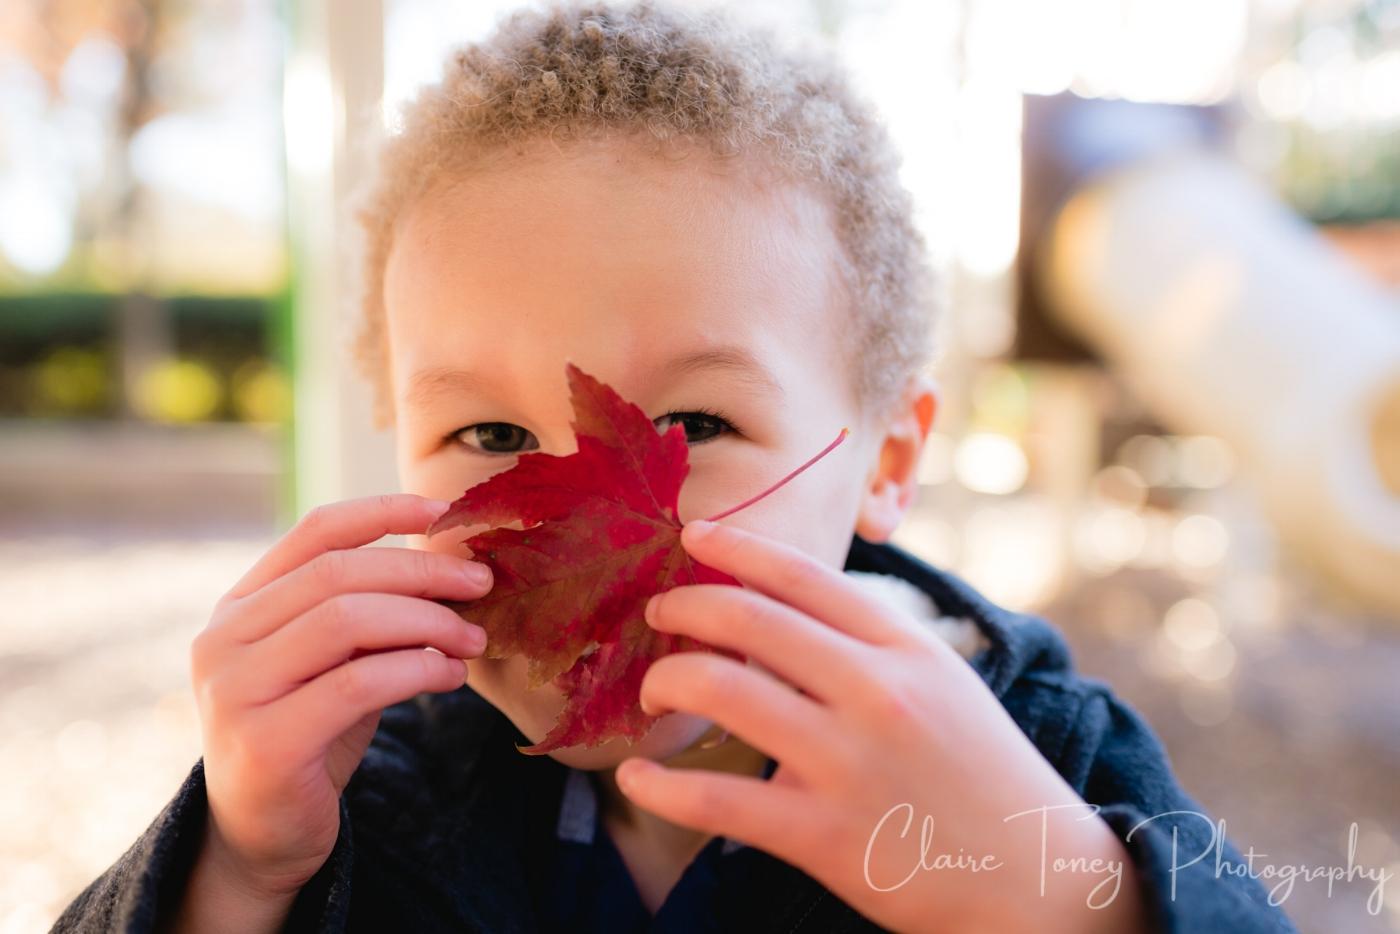 boy peeking over red leaf in playground